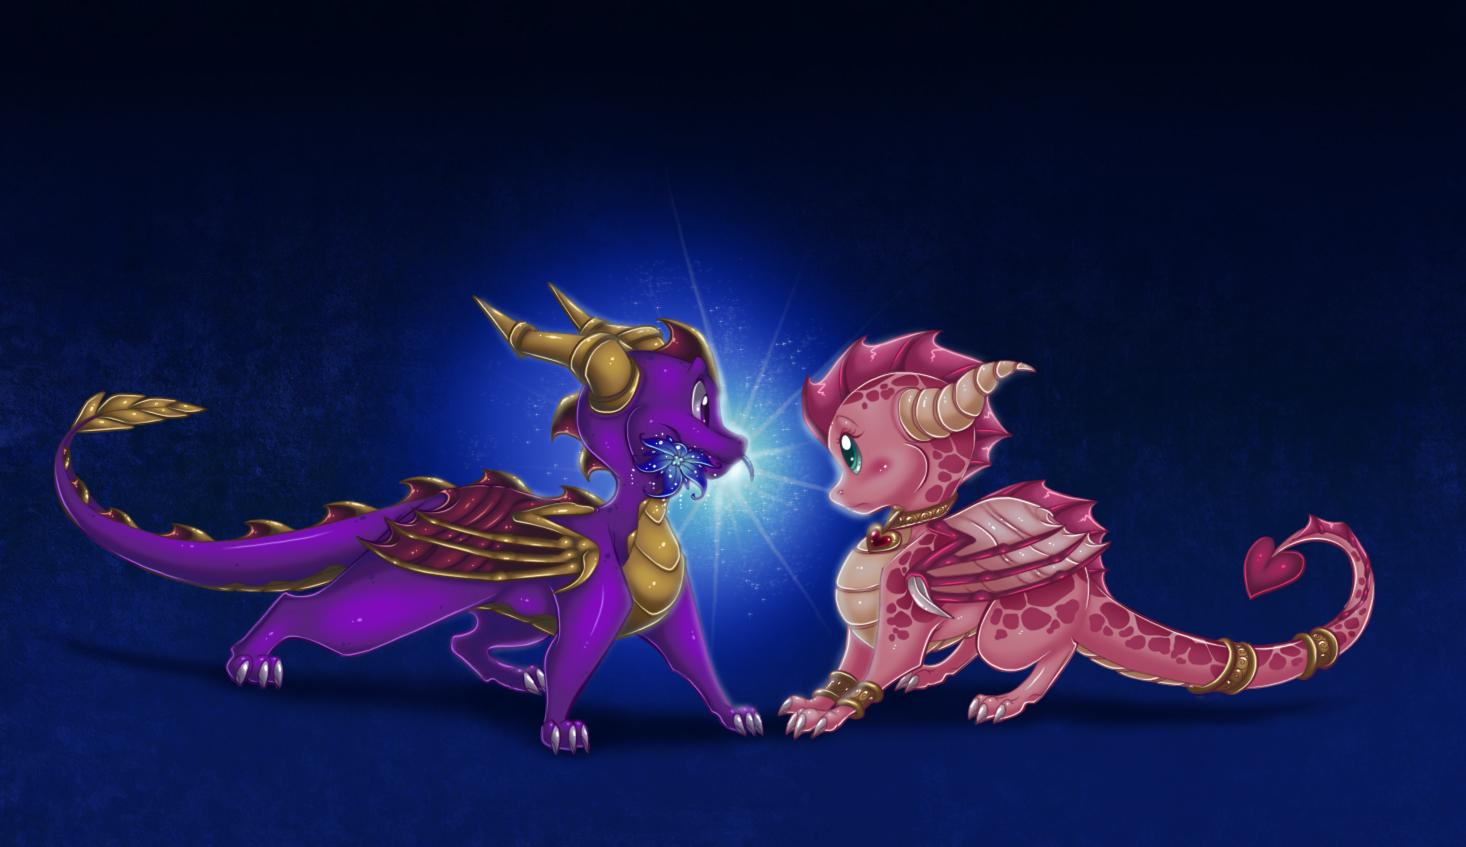 Spyro The Dragon The Legend Of Spyro Zerochan Anime Image Board